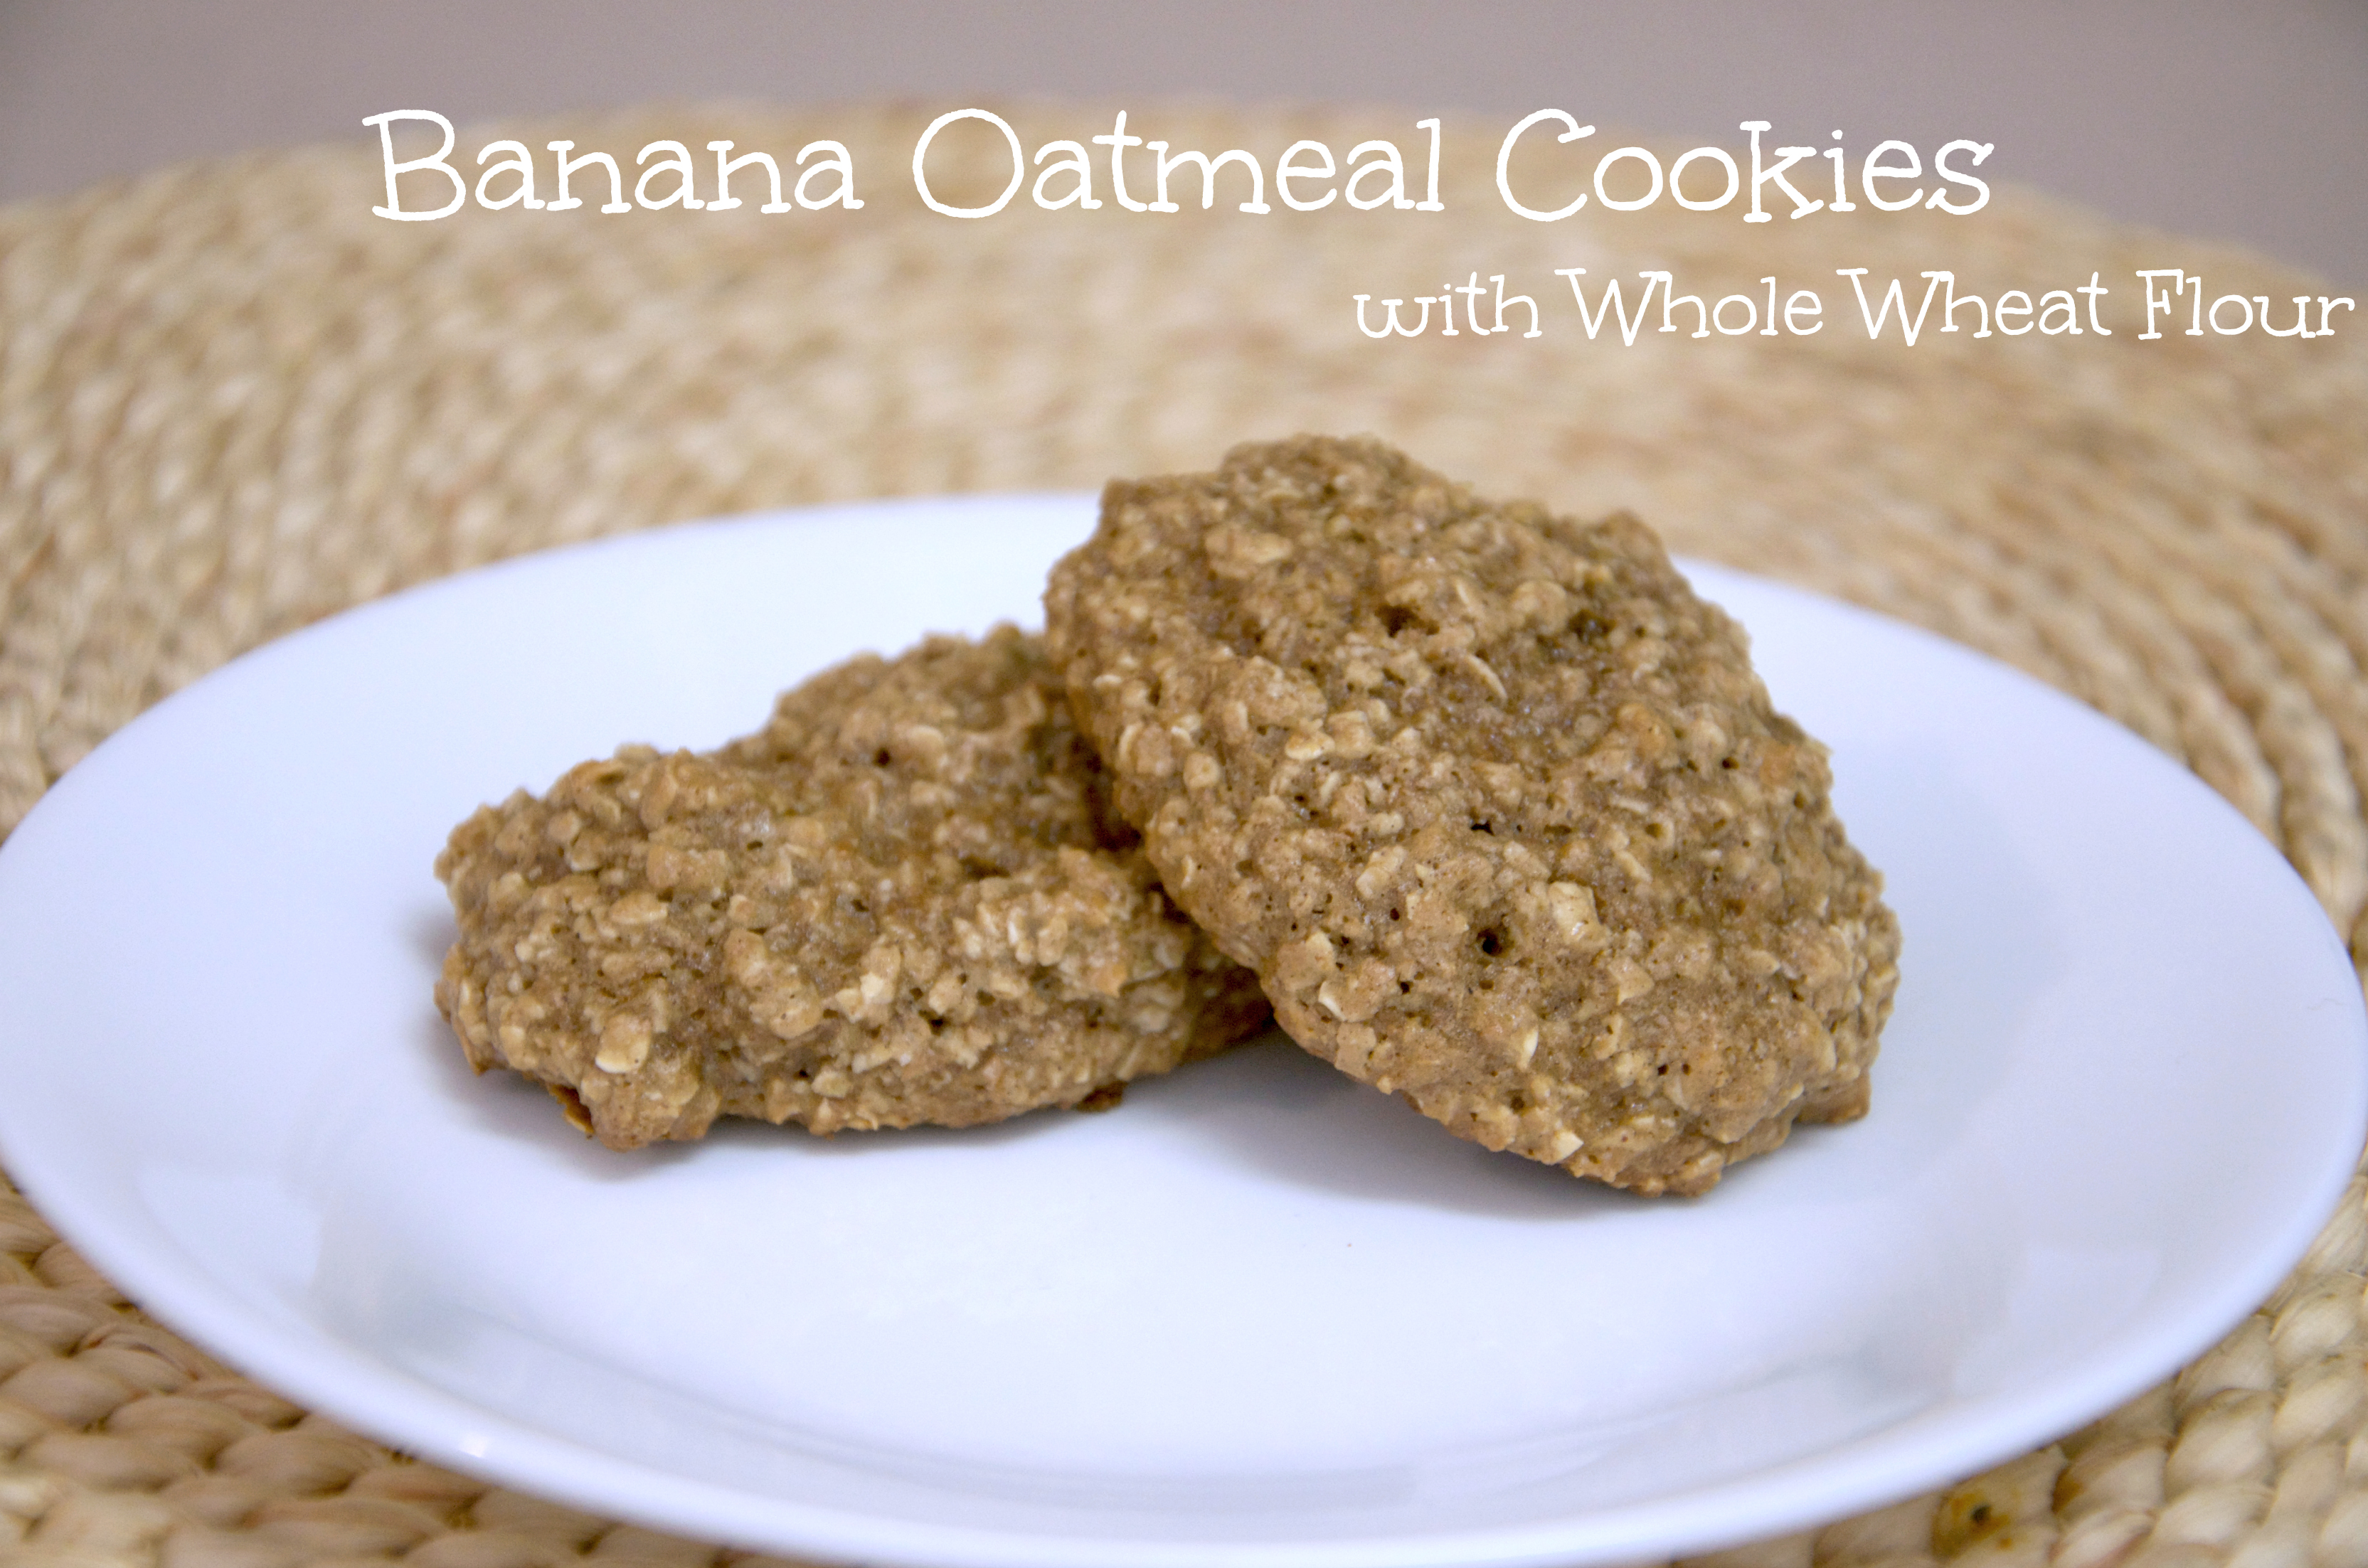 banana oatmeal cookies and so banana oatmeal cookies were born